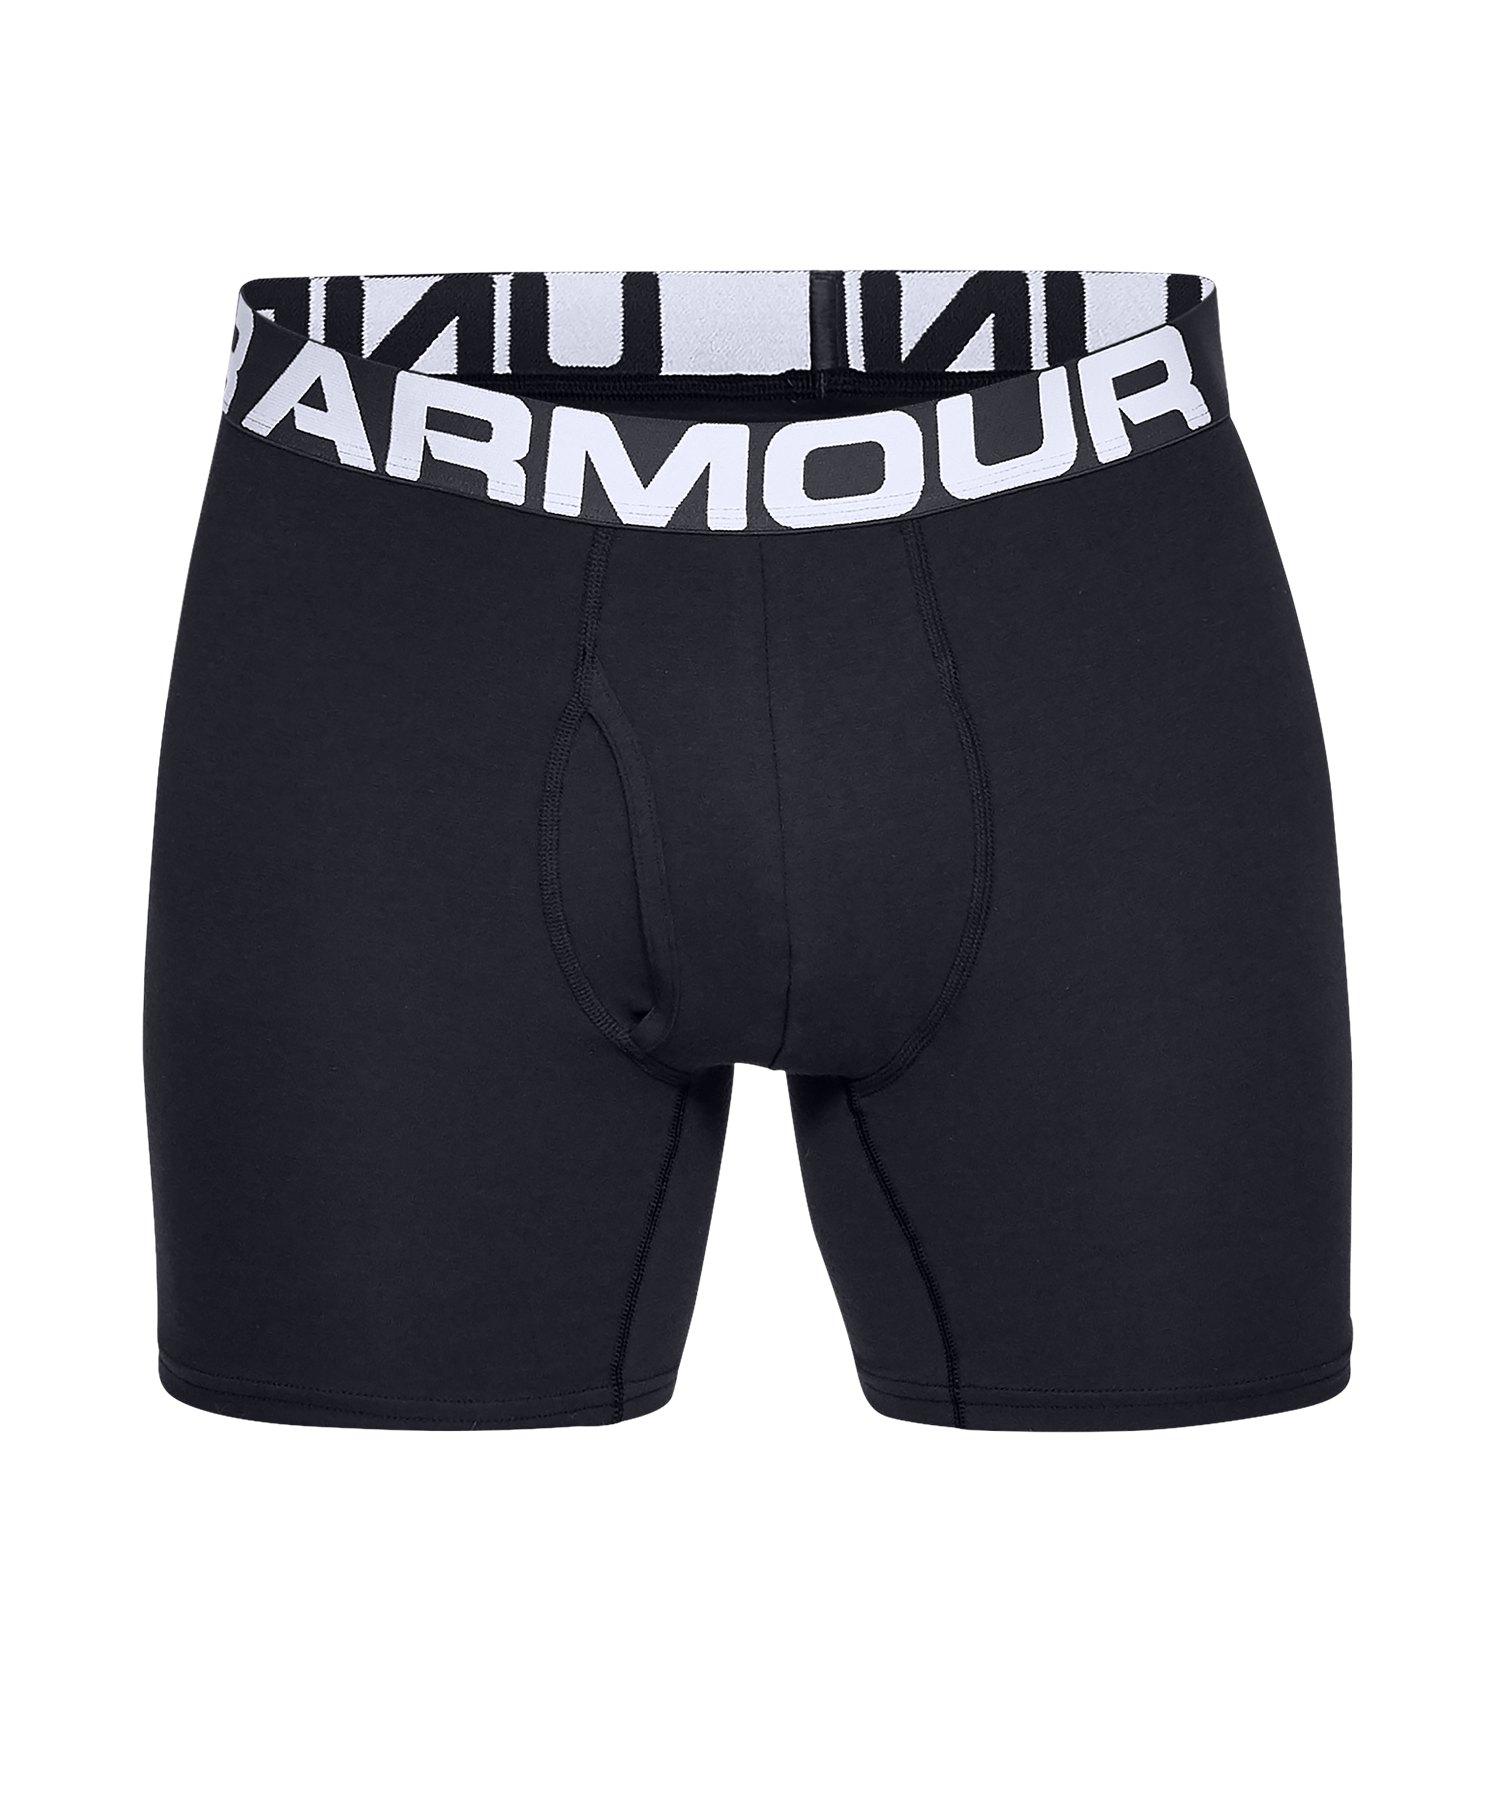 Under Armour Charged Boxerjock Short 3er Pack F001 - schwarz